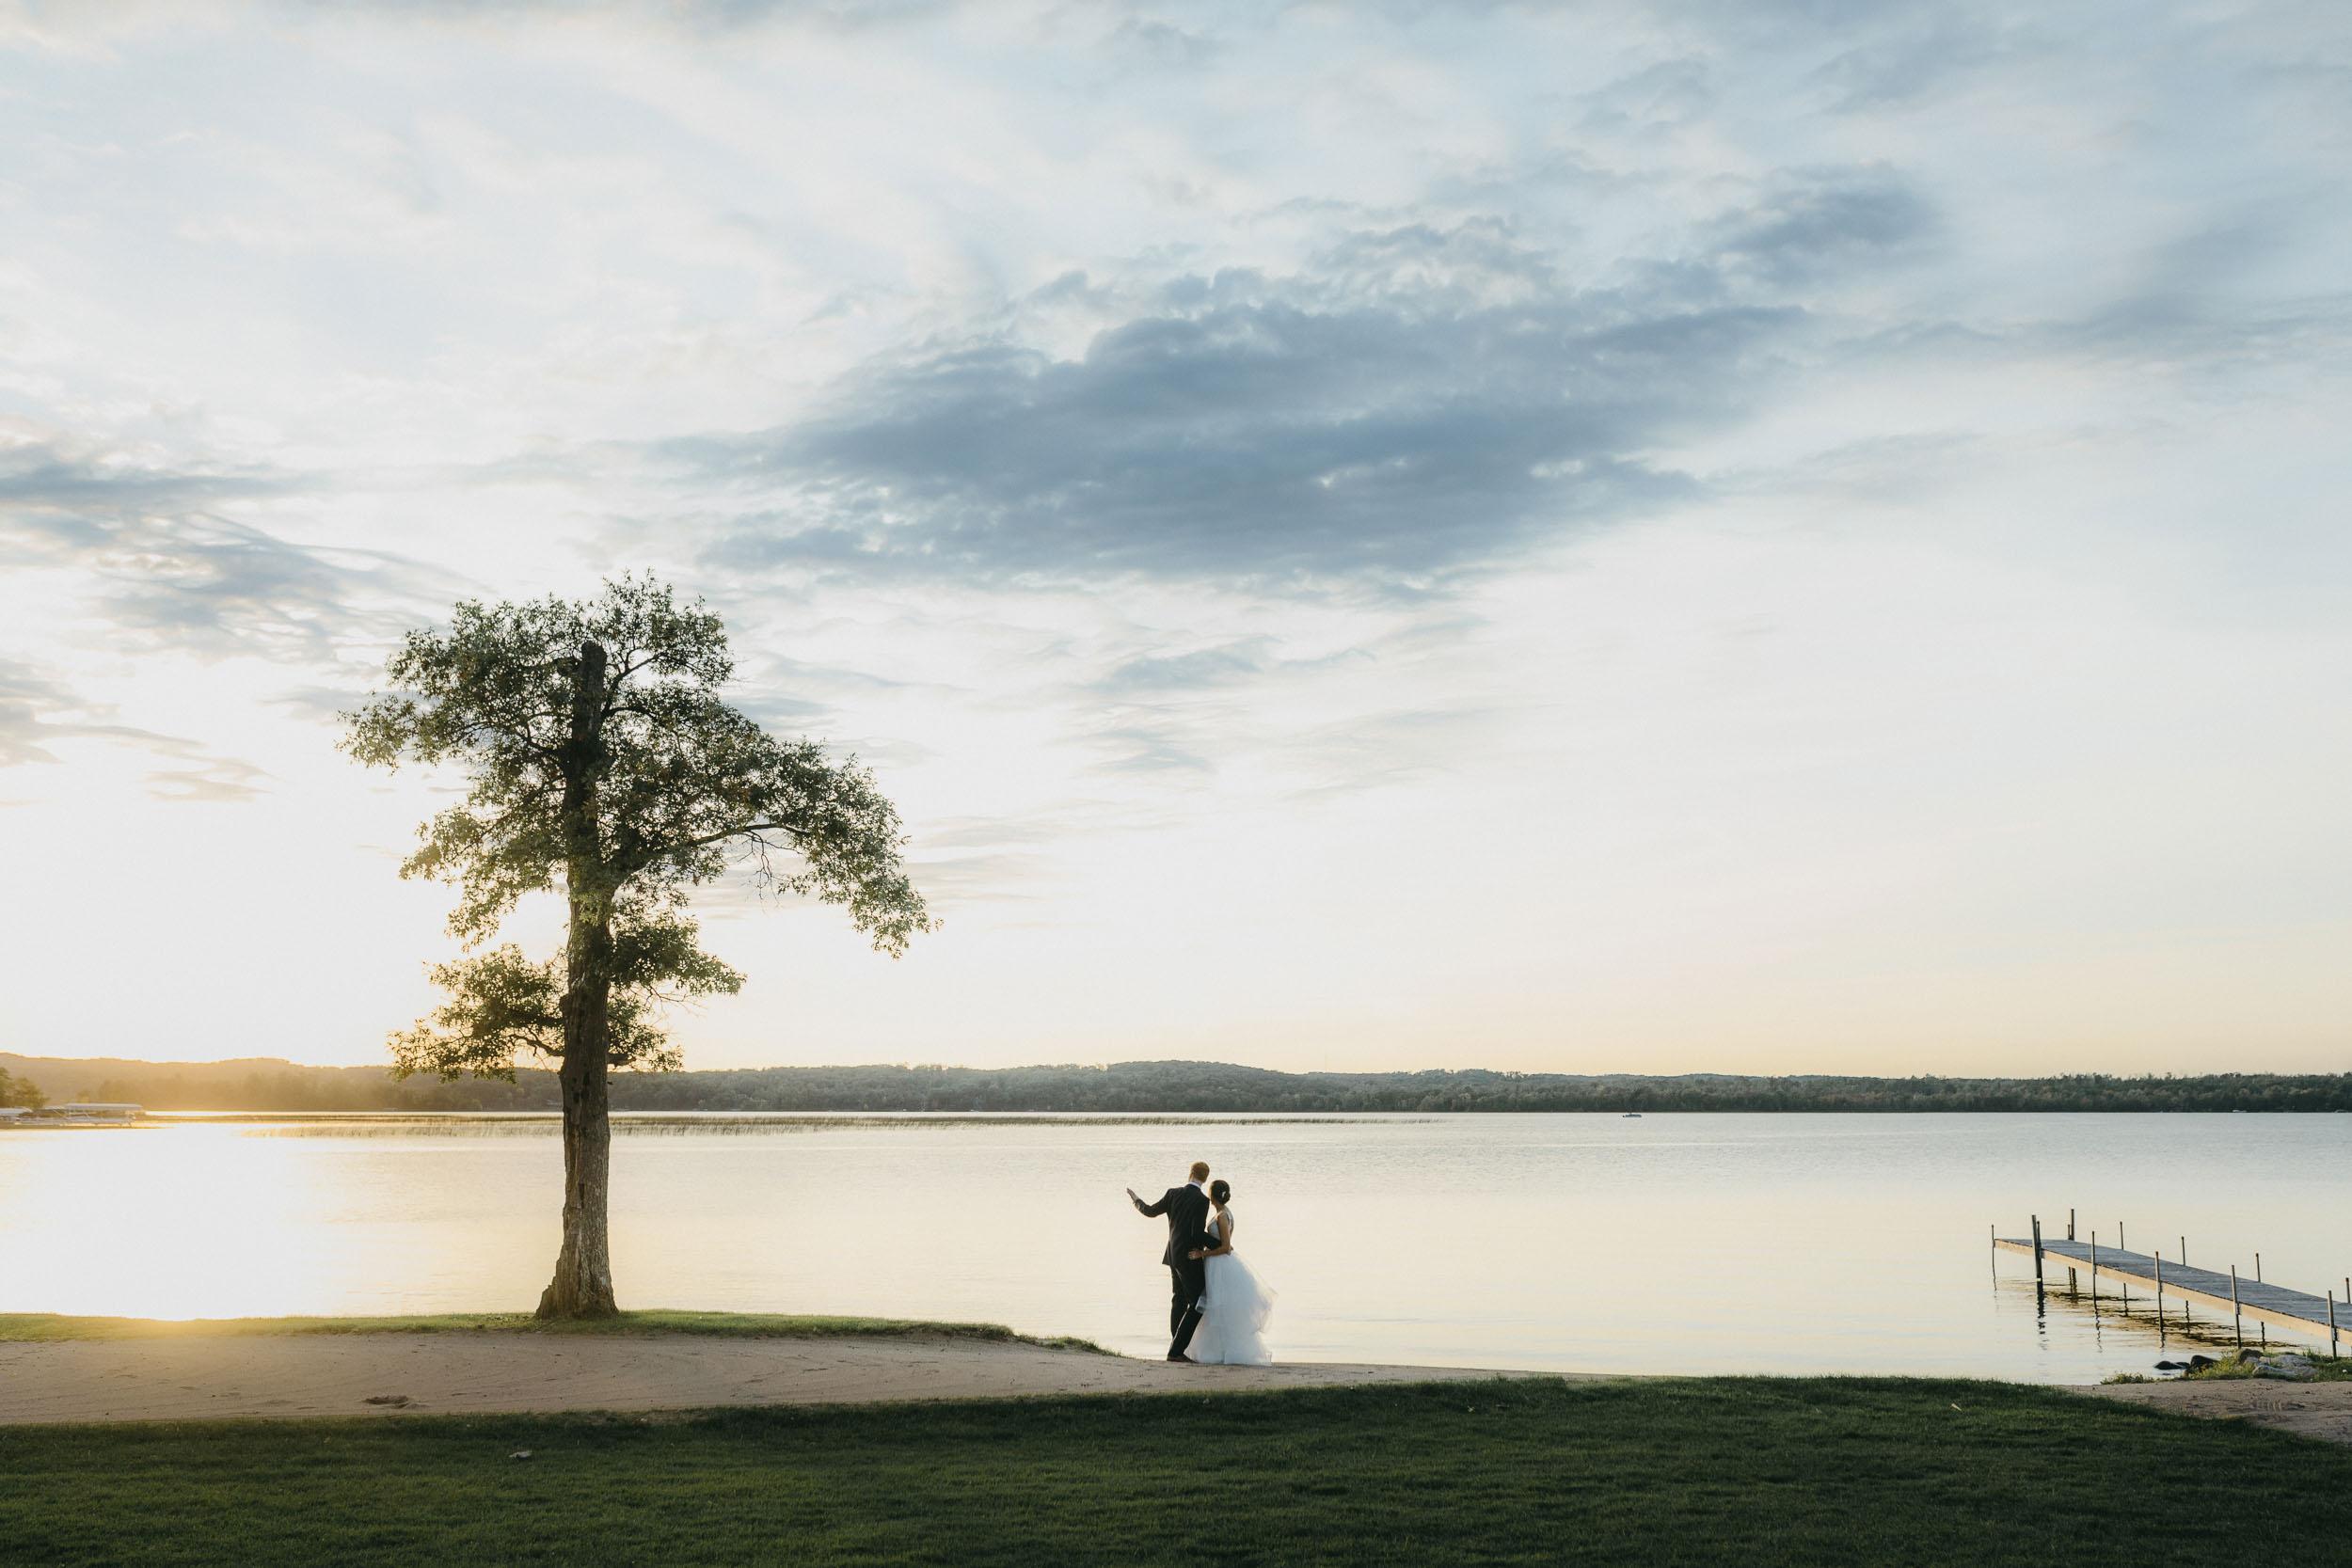 32-maddens resort minnesota creative wedding photographer-1.jpg